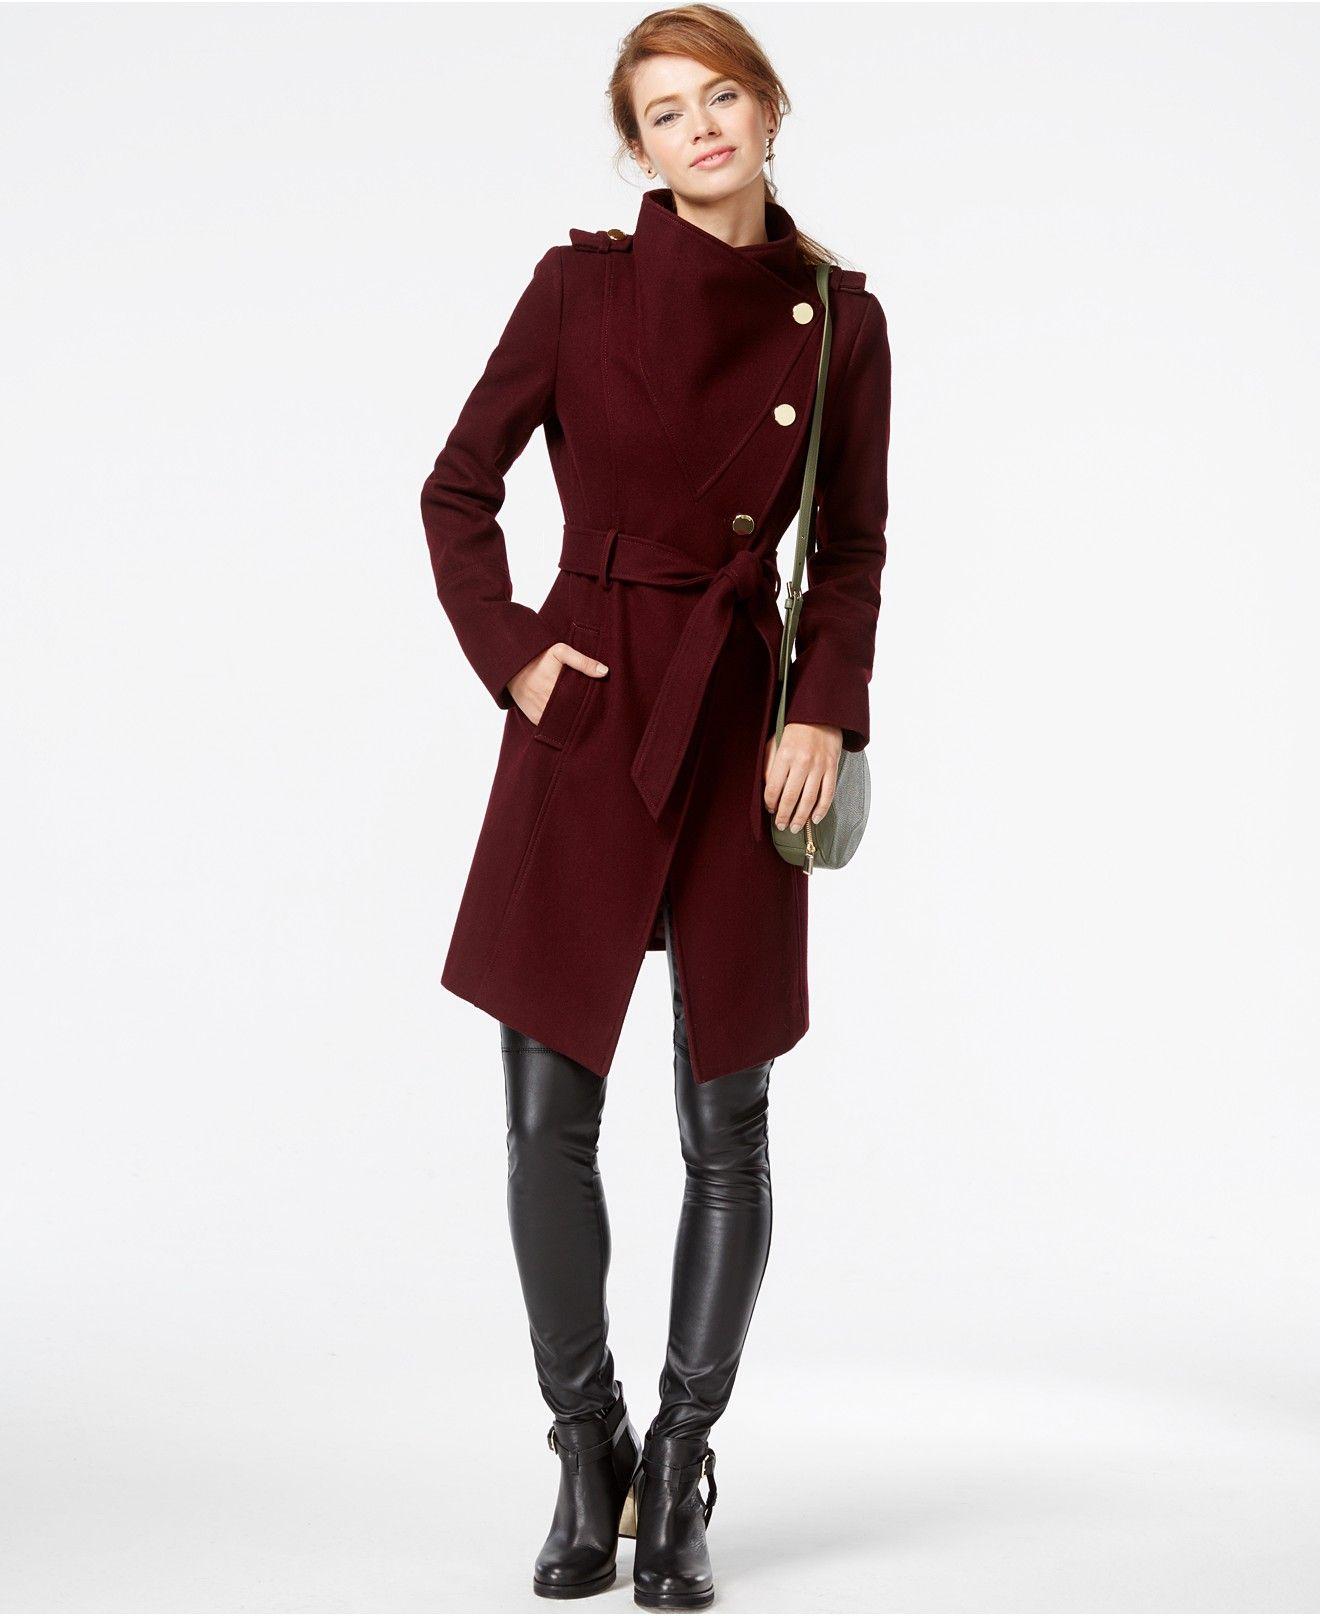 GUESS Funnel Collar Asymmetrical Coat GUESS Coats Amp Jackets Women Macys LooksJacket